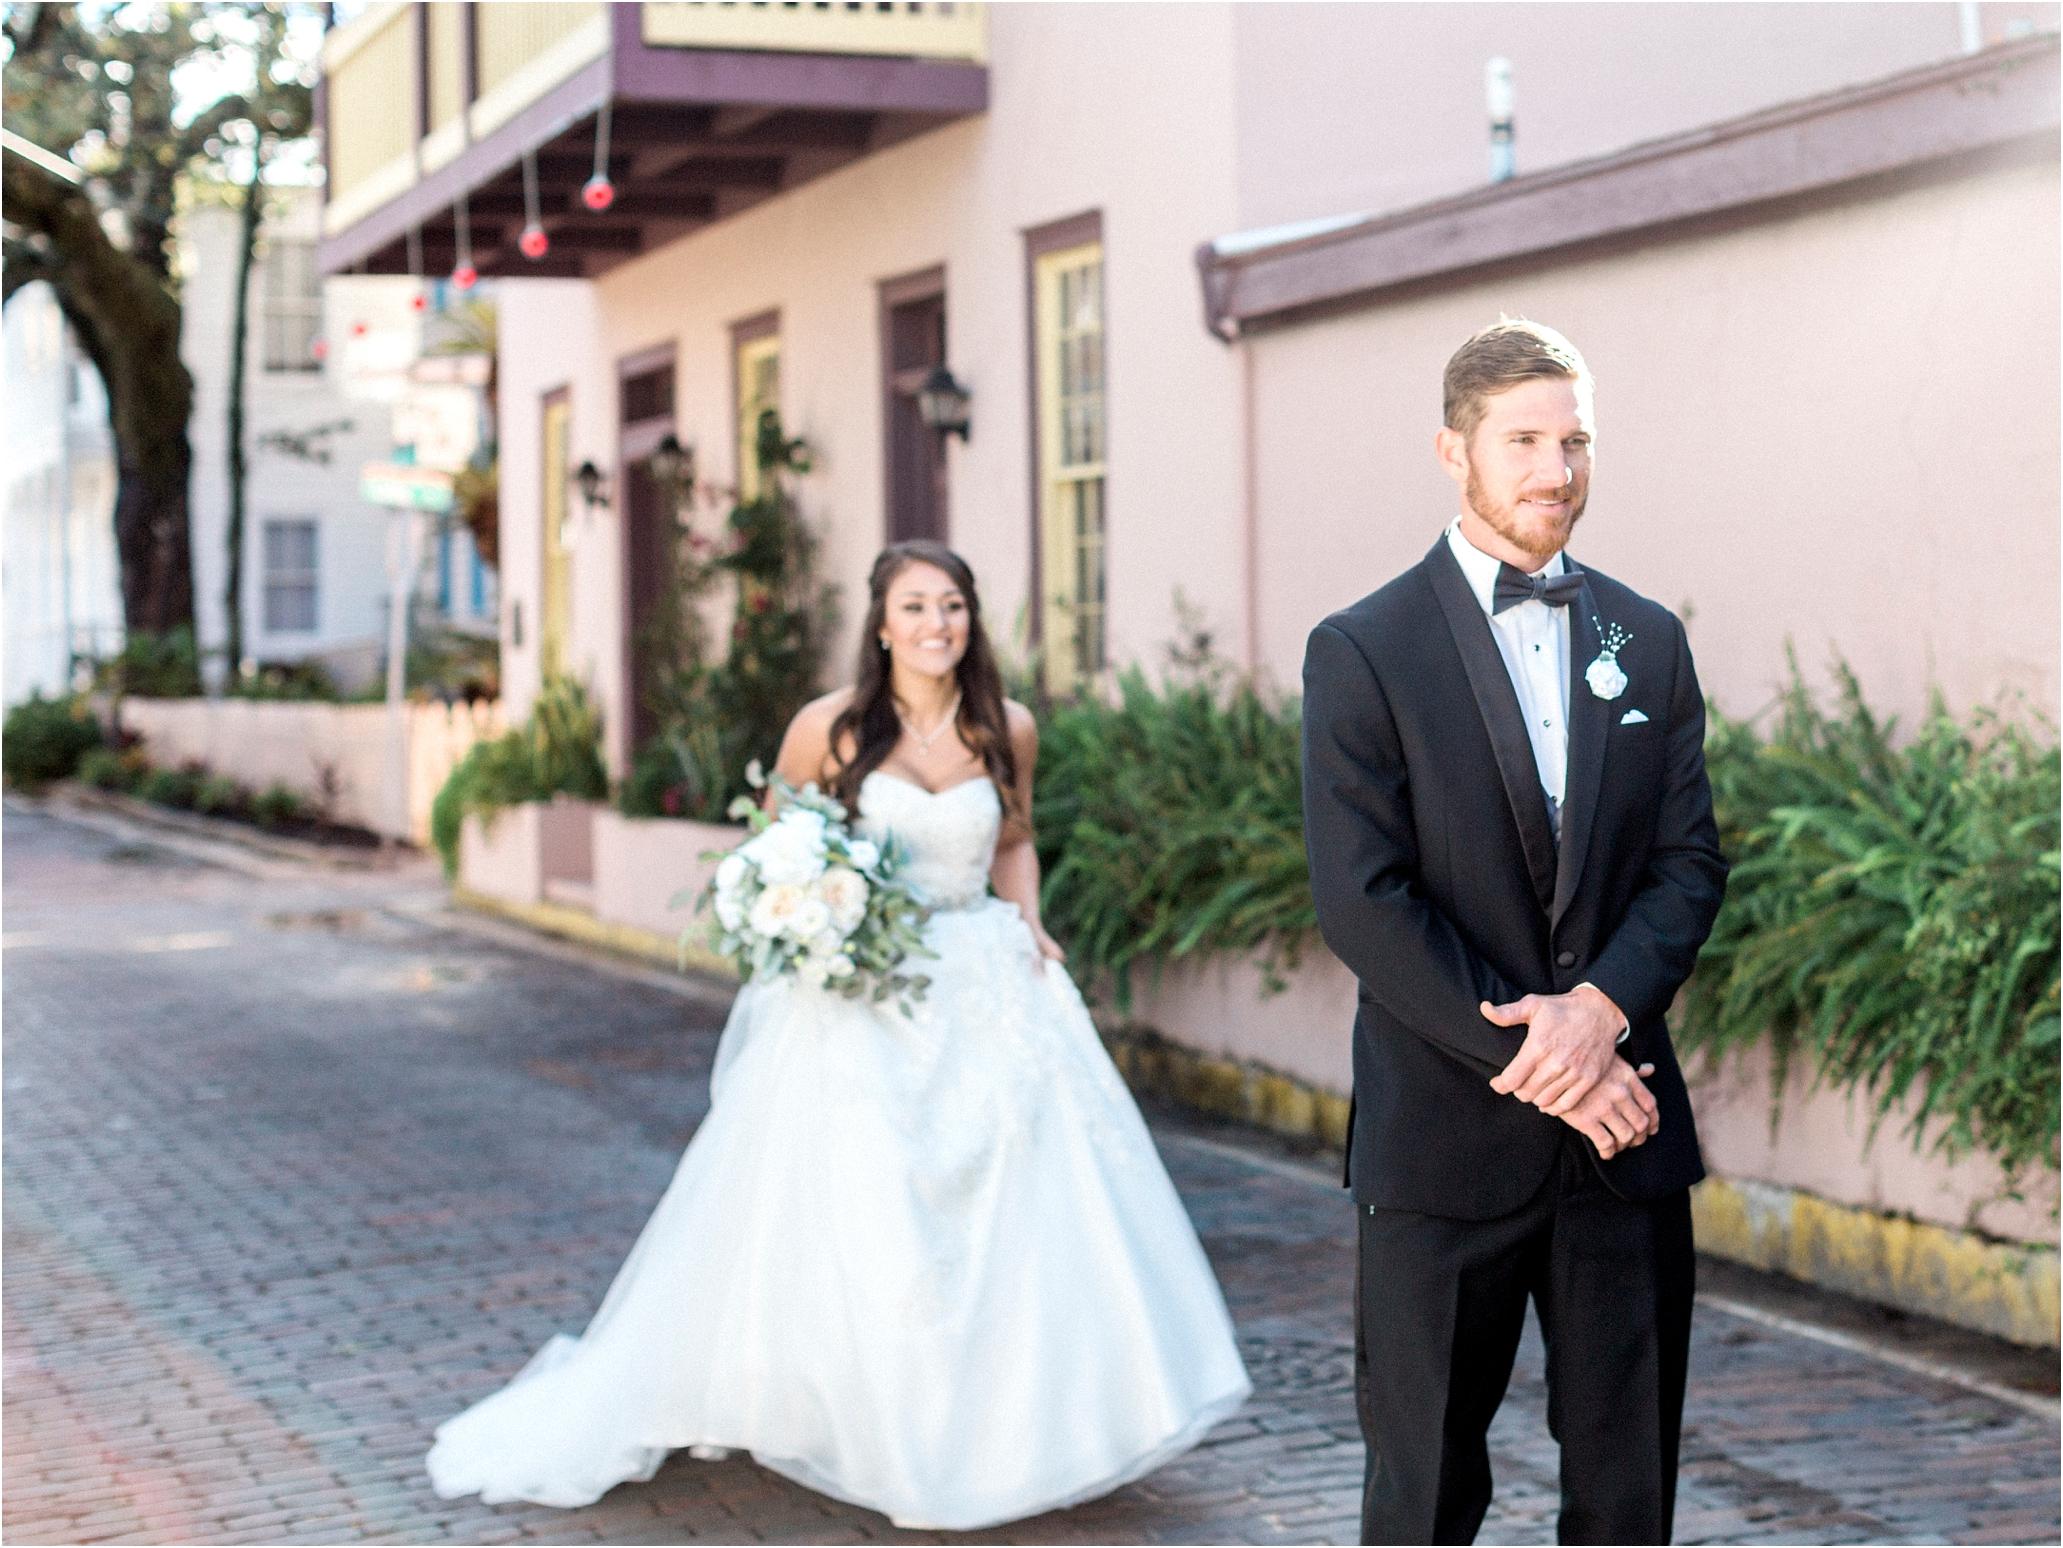 Lisa Silva Photography- Ponte Vedra Beach and Jacksonville, Florida Fine Art Film Wedding Photography- Wedding at The White Room Villa Blanca in St. Augustine, Florida_0033.jpg